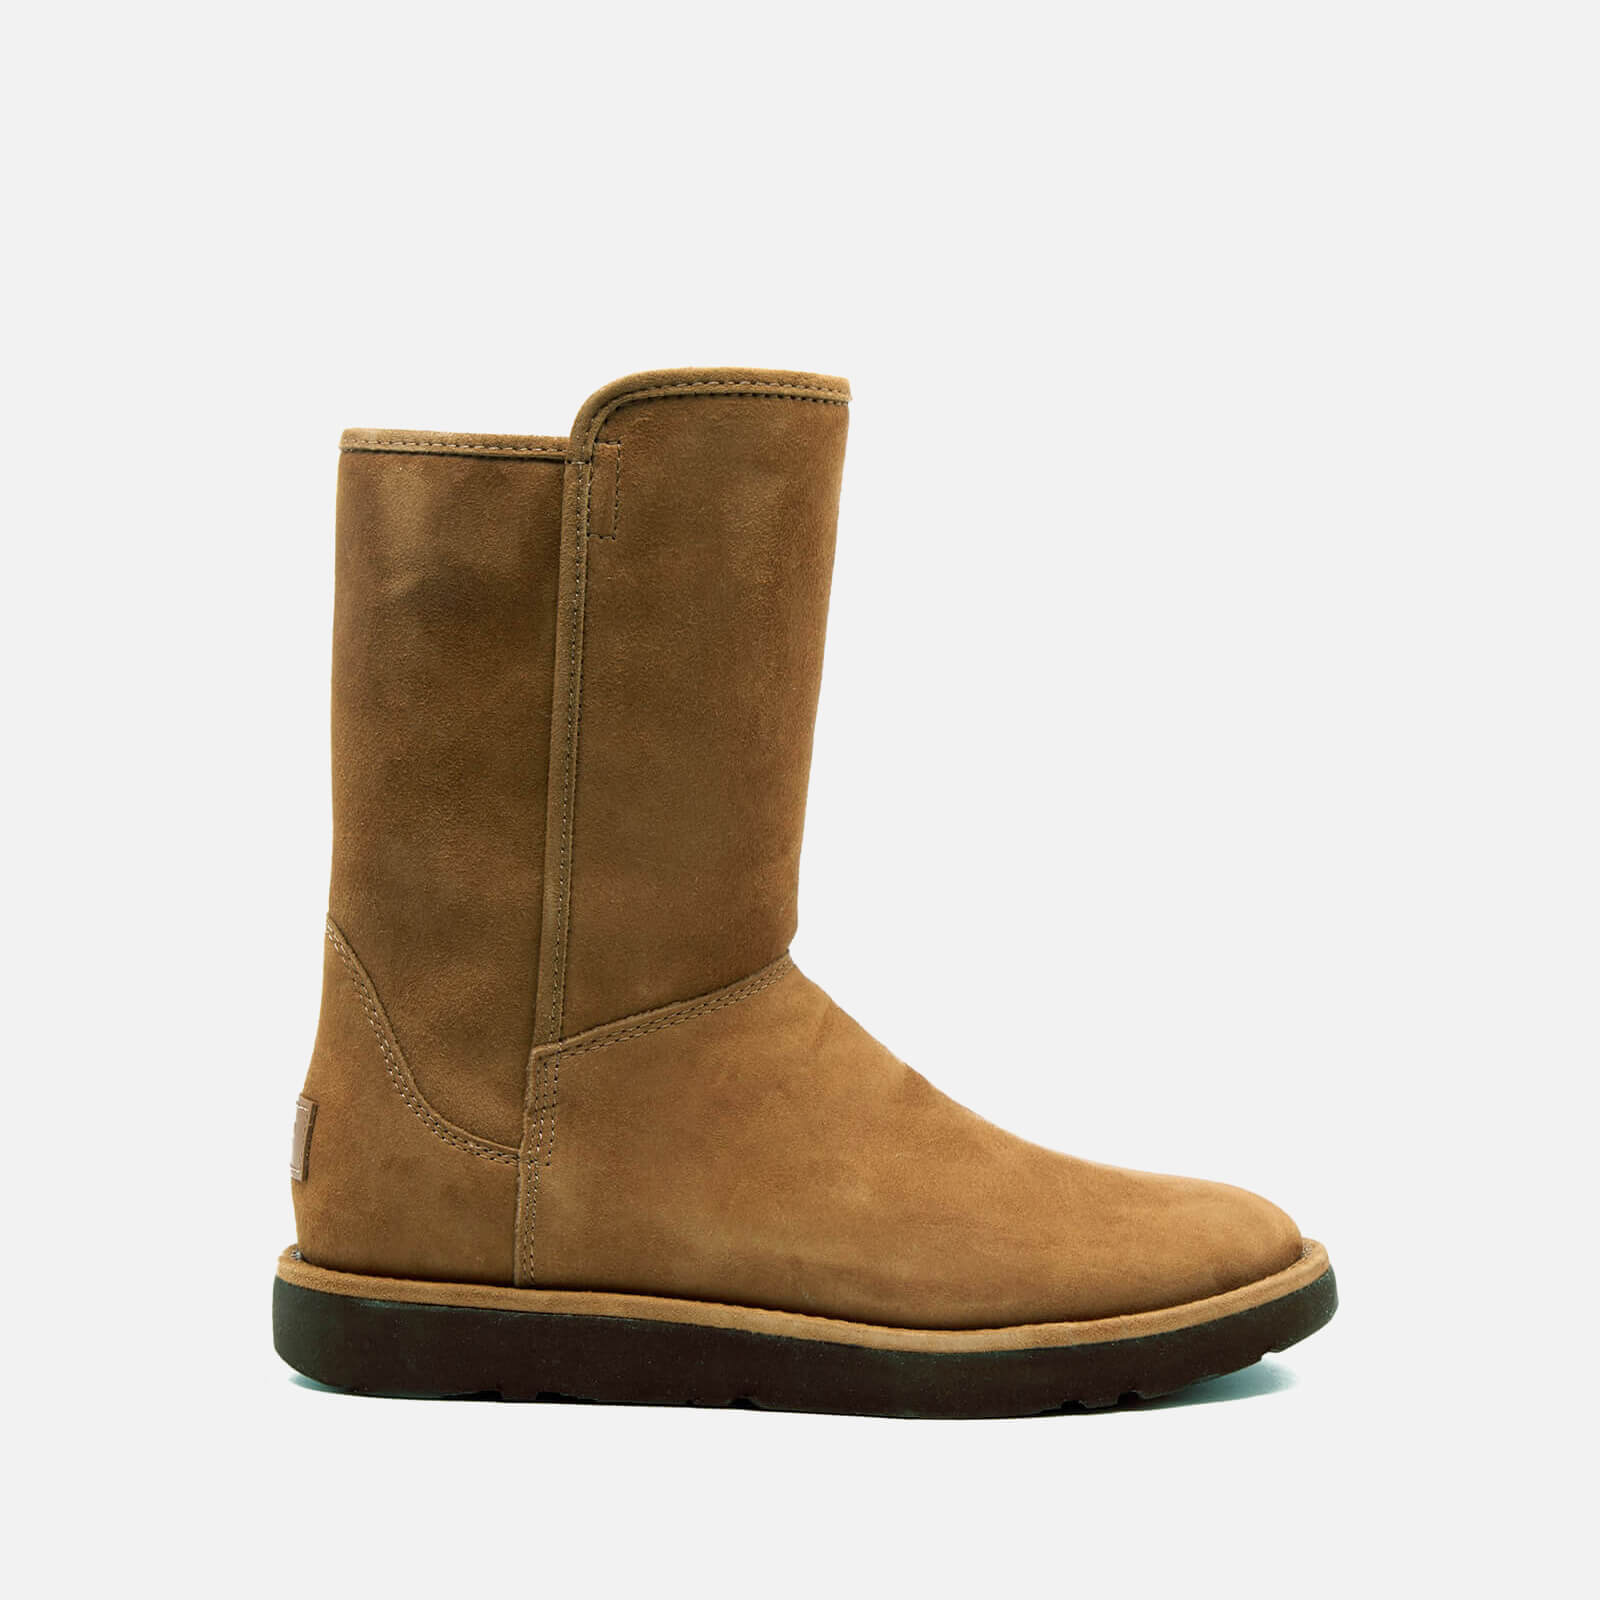 4d561e96c3d UGG Women's Abree Short II Classic Luxe Sheepskin Boots - Bruno